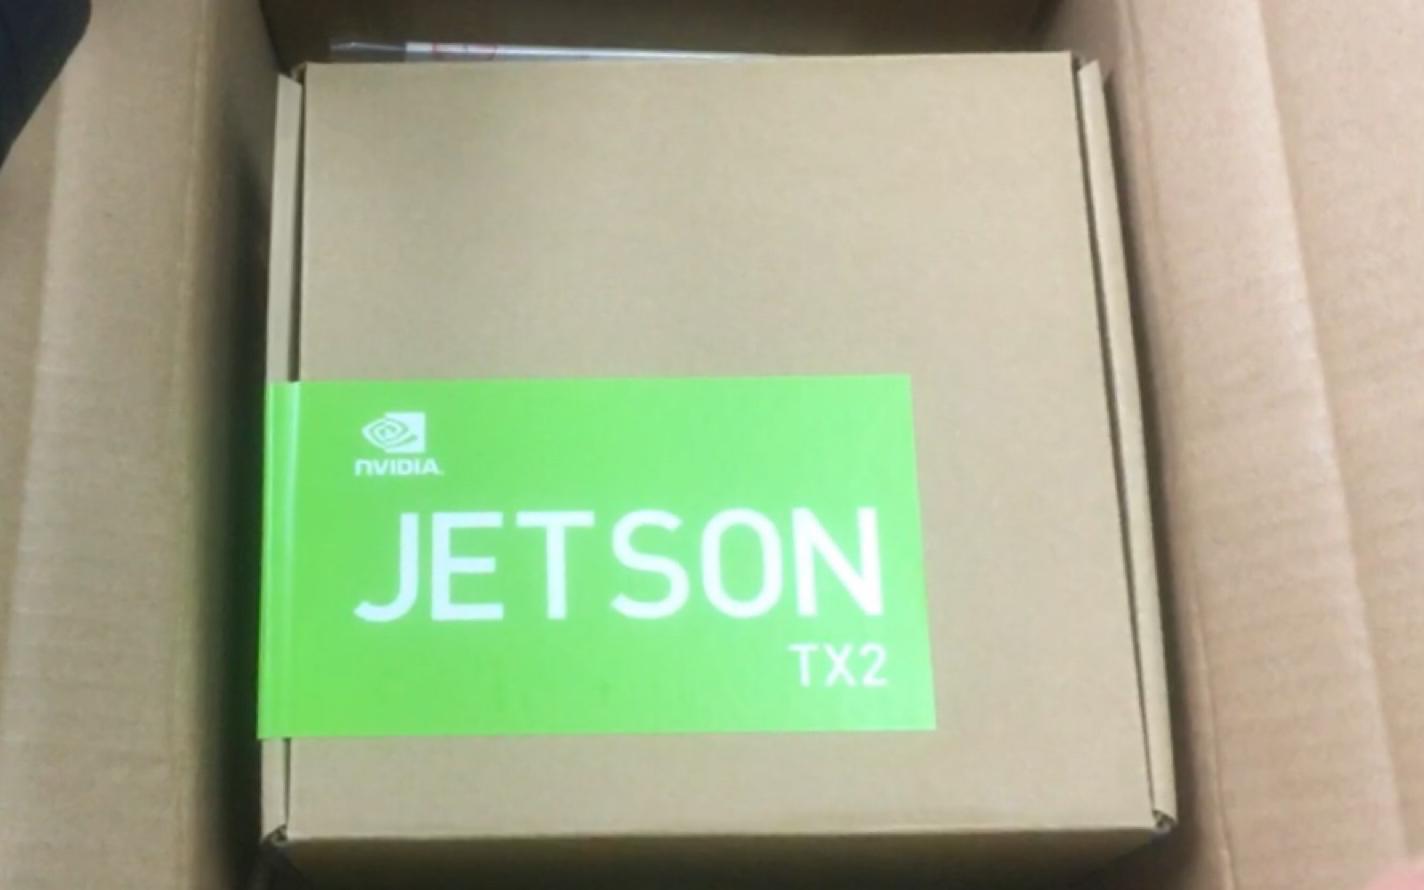 Mobilenet Ssd Jetson Tx2